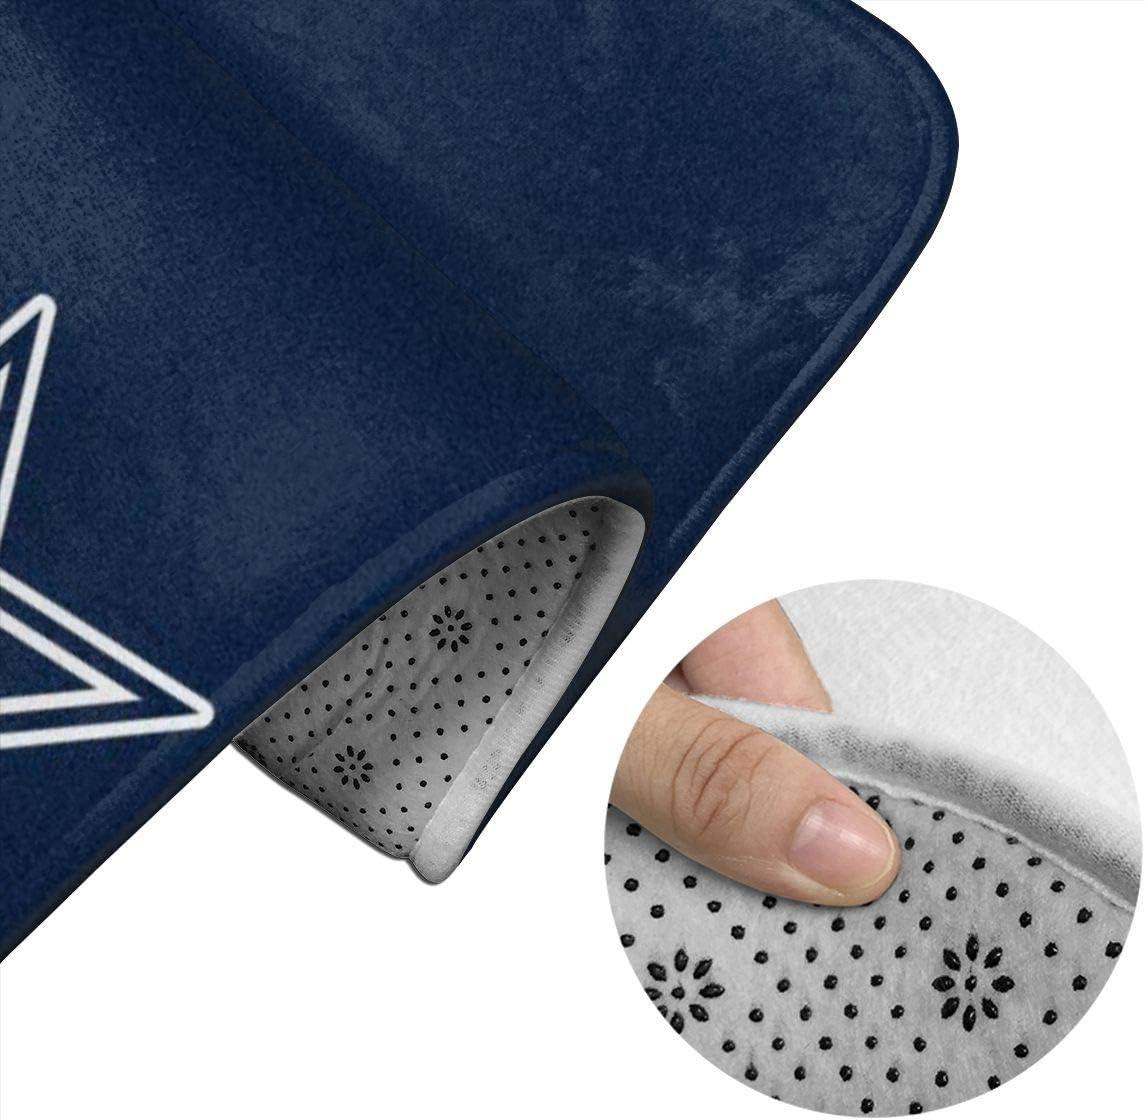 Shower 23.6 X 15.7 U-Shaped Toilet Pedestal Rug- Dallas Cowboys Art Print Flannel Bath Mat Washable Non Slip for Tub Yy10 Bathroom Rug Set 2 Piece